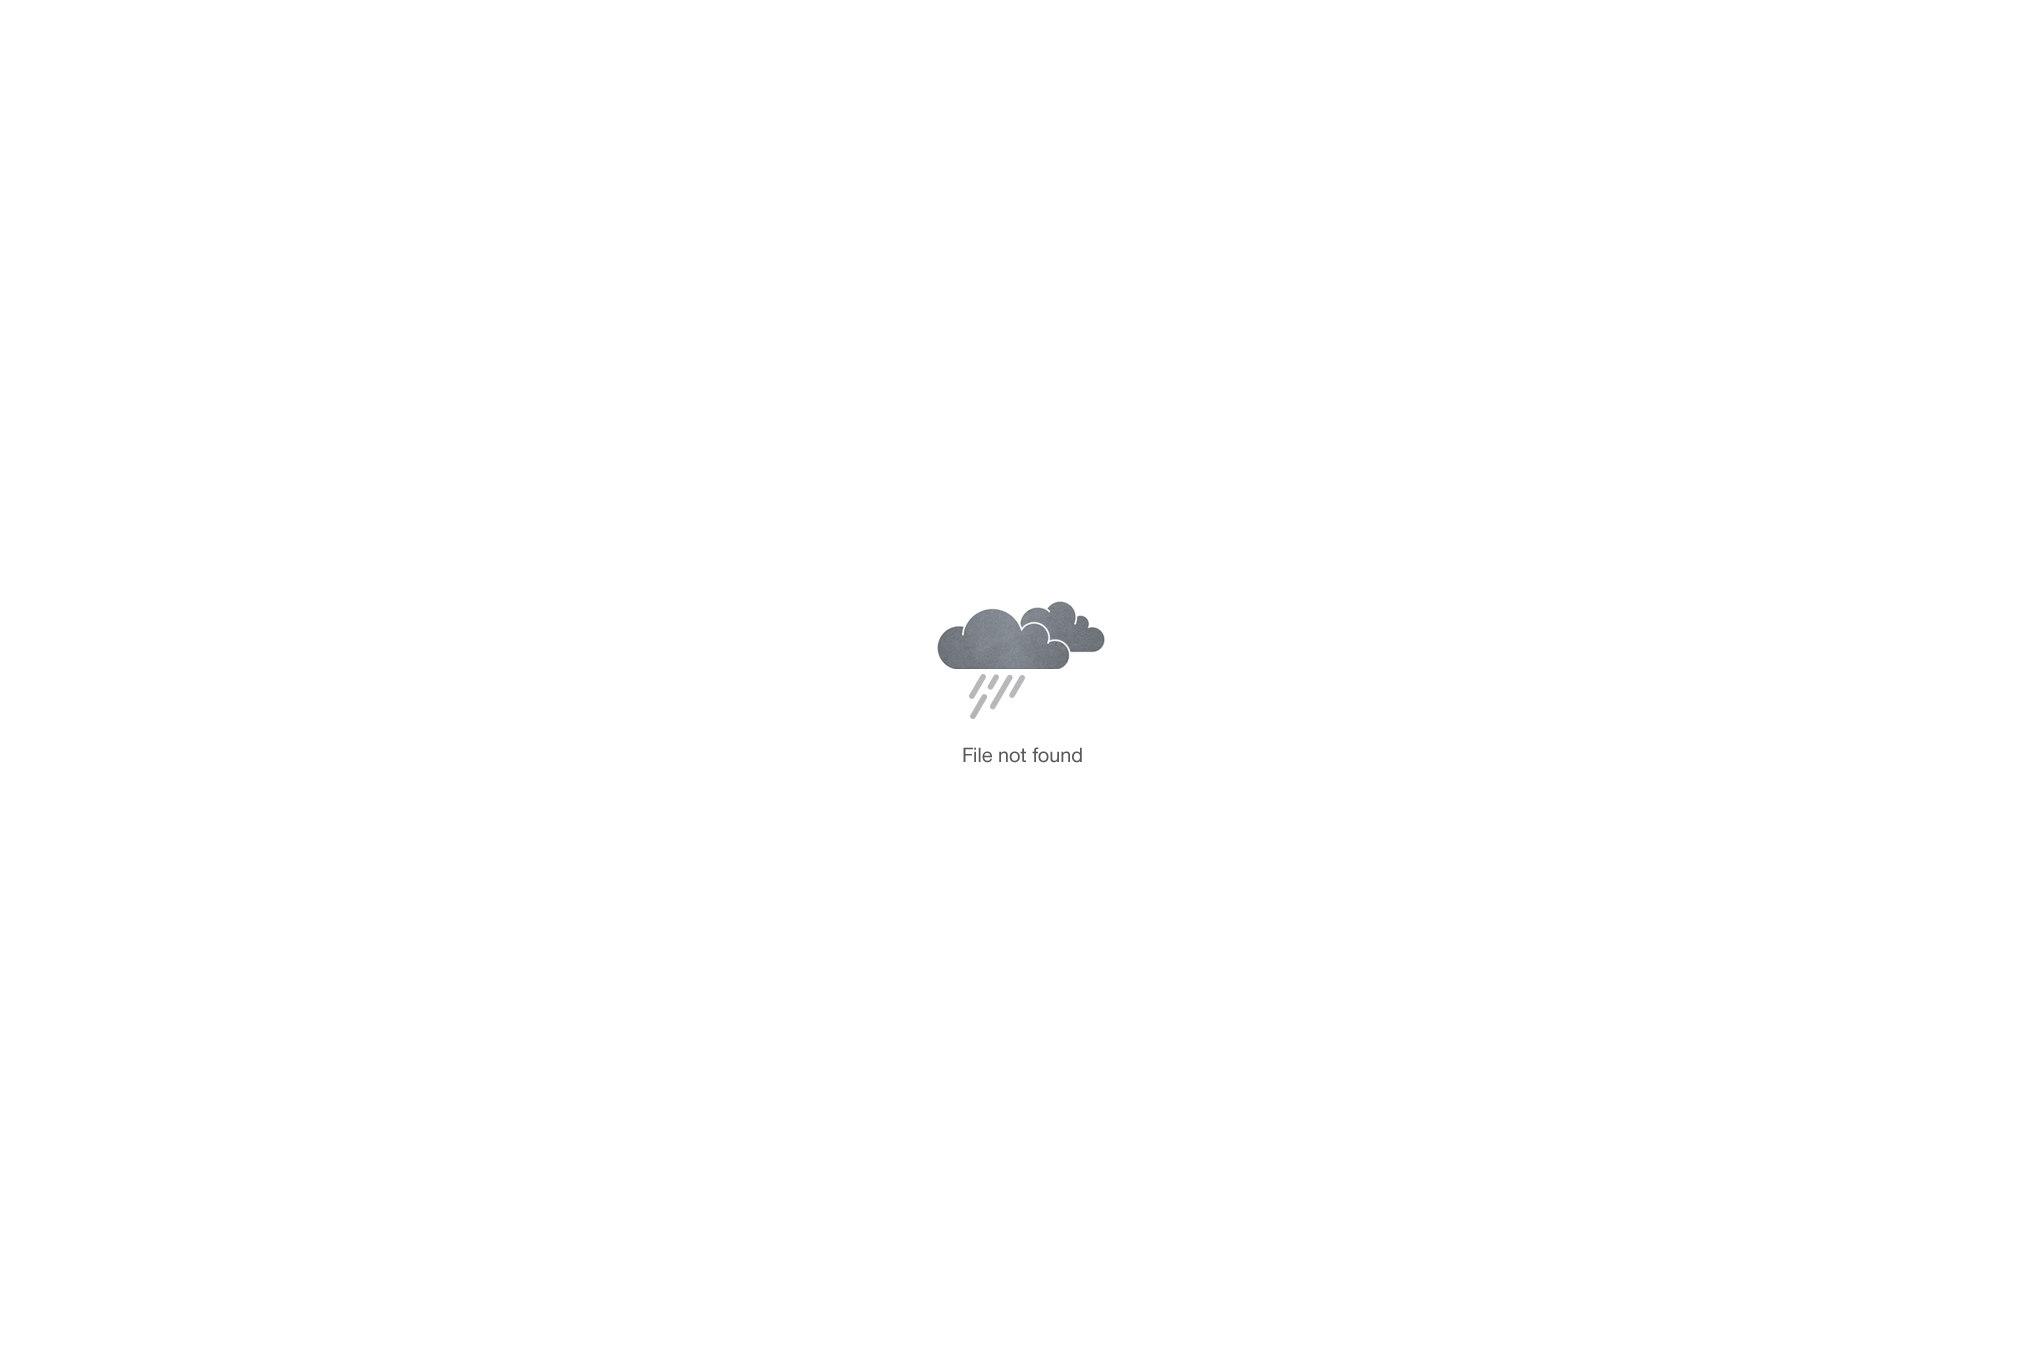 Arthur-Bosseboeuf-Rugby-Sponsorise-me-image-4